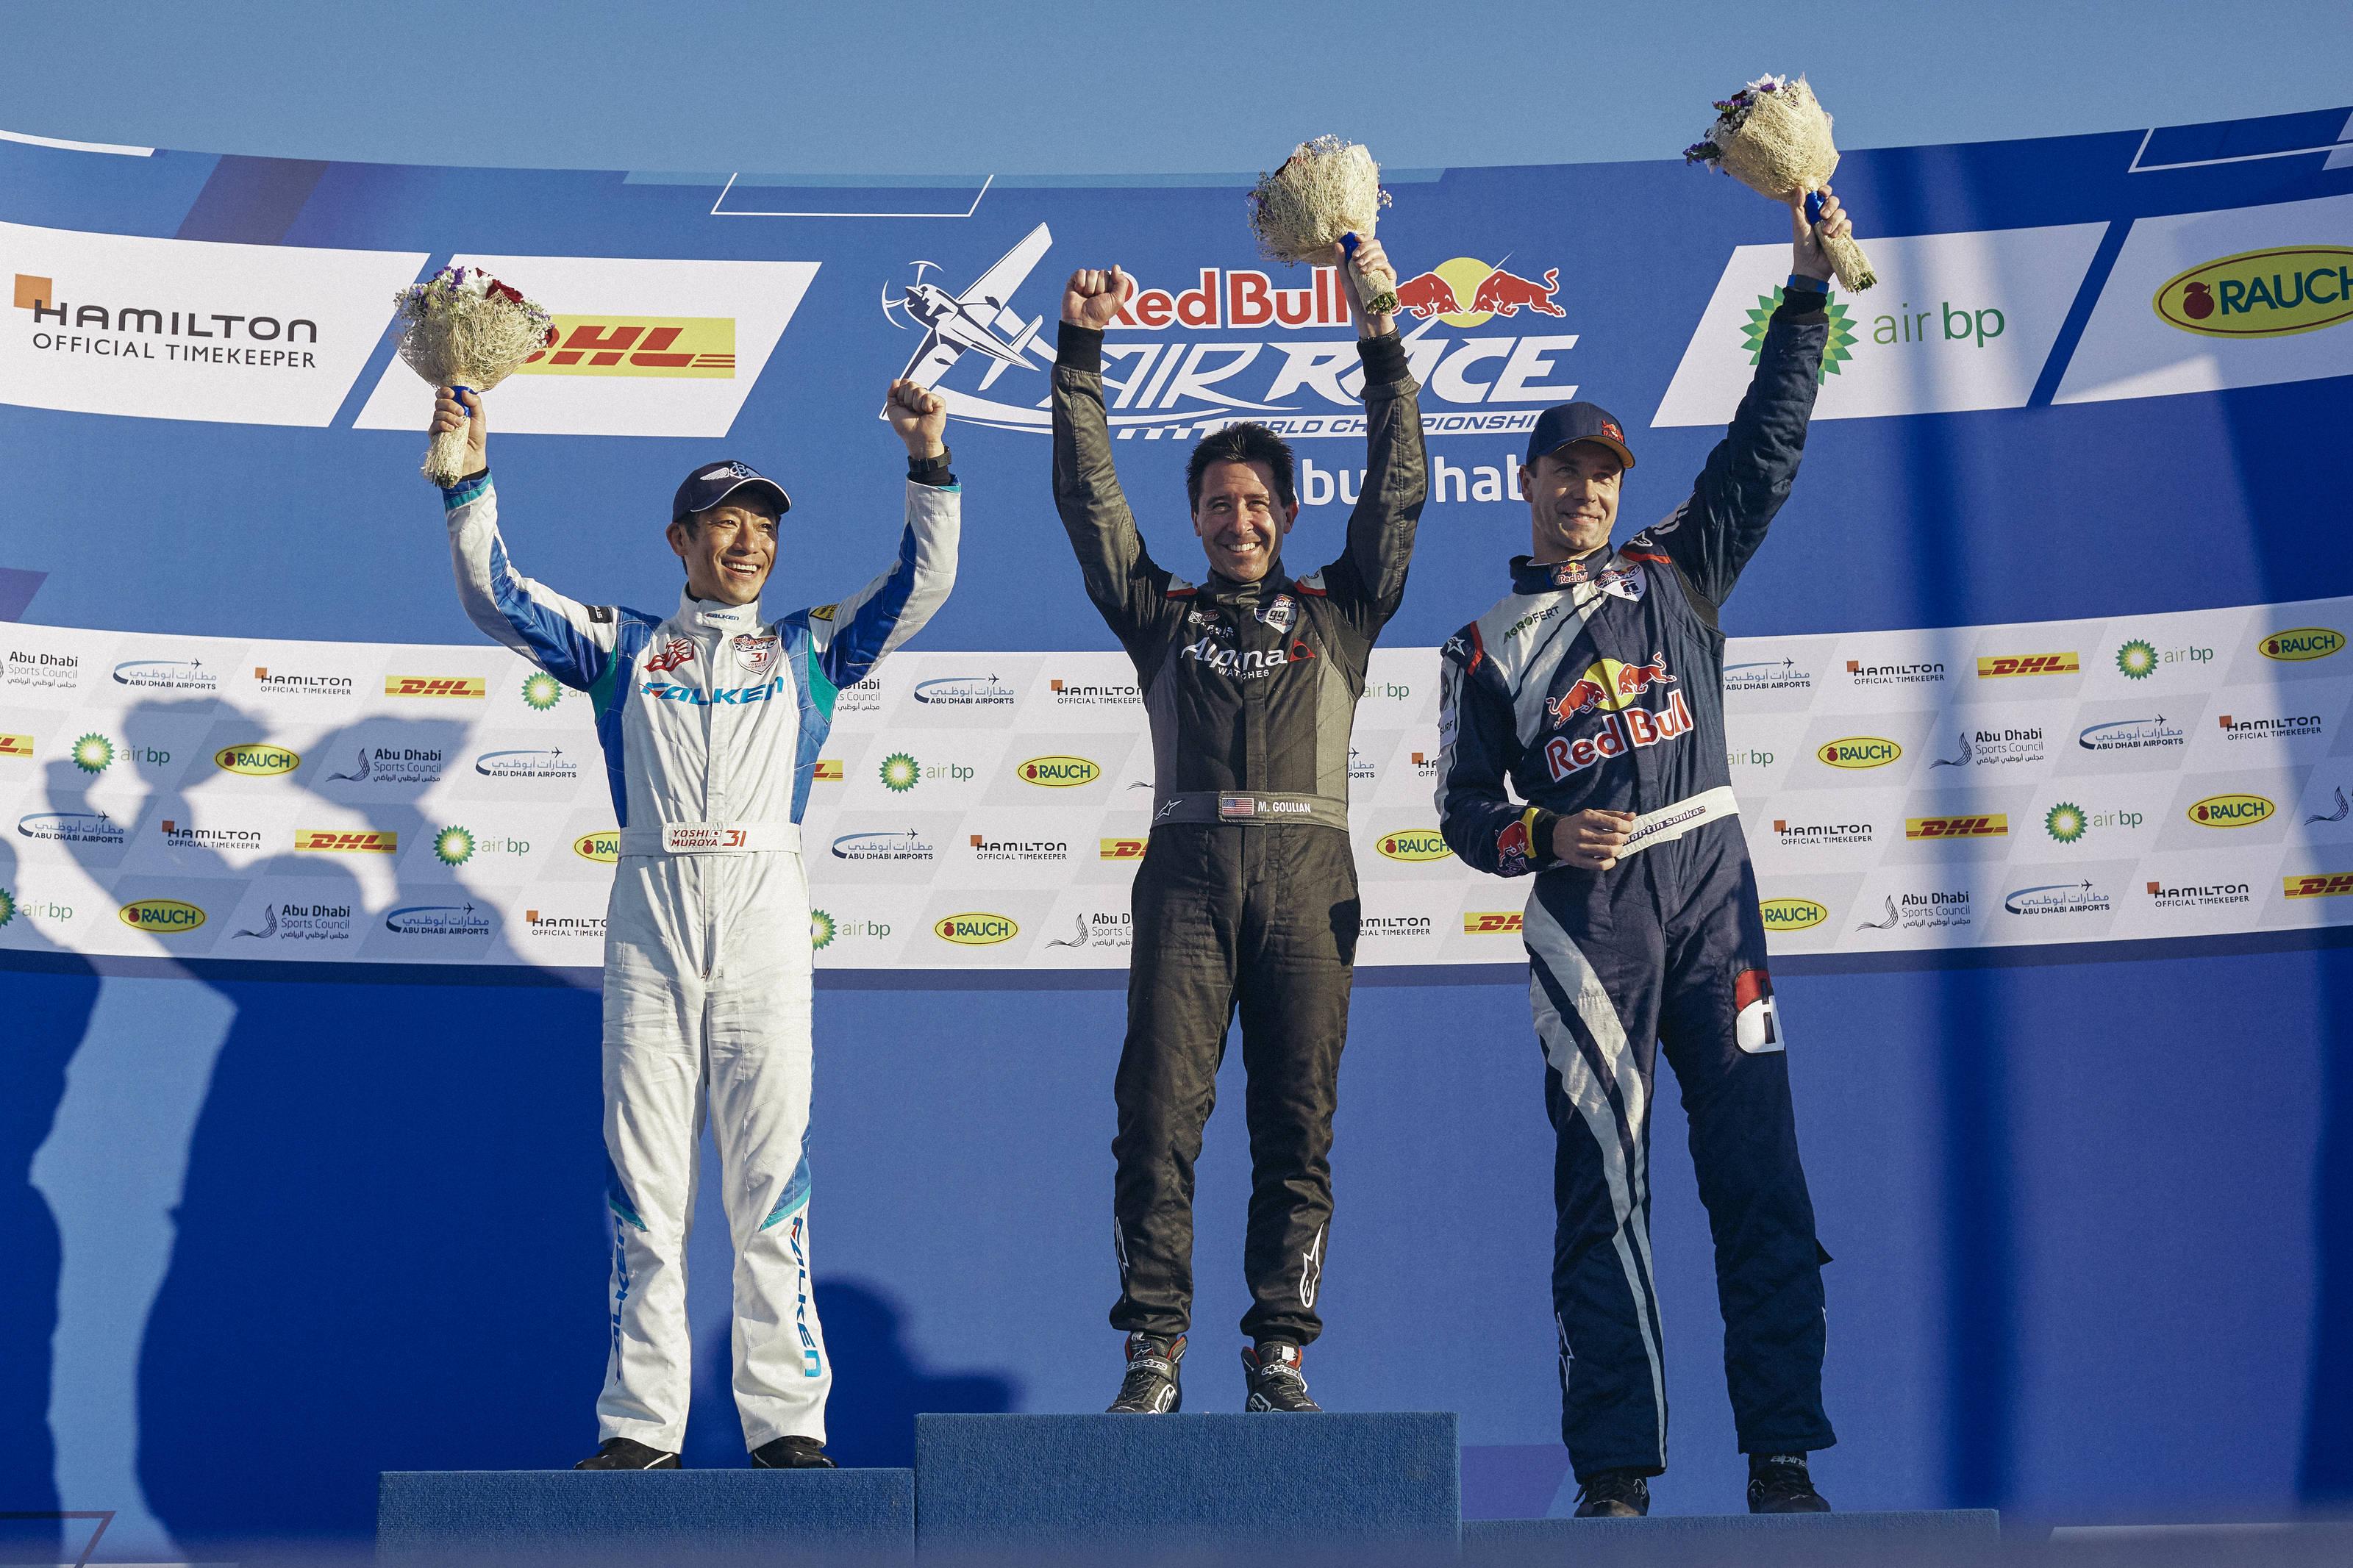 Michael Goulian Wins RBAR Abu Dhabi – Leads 2018 World